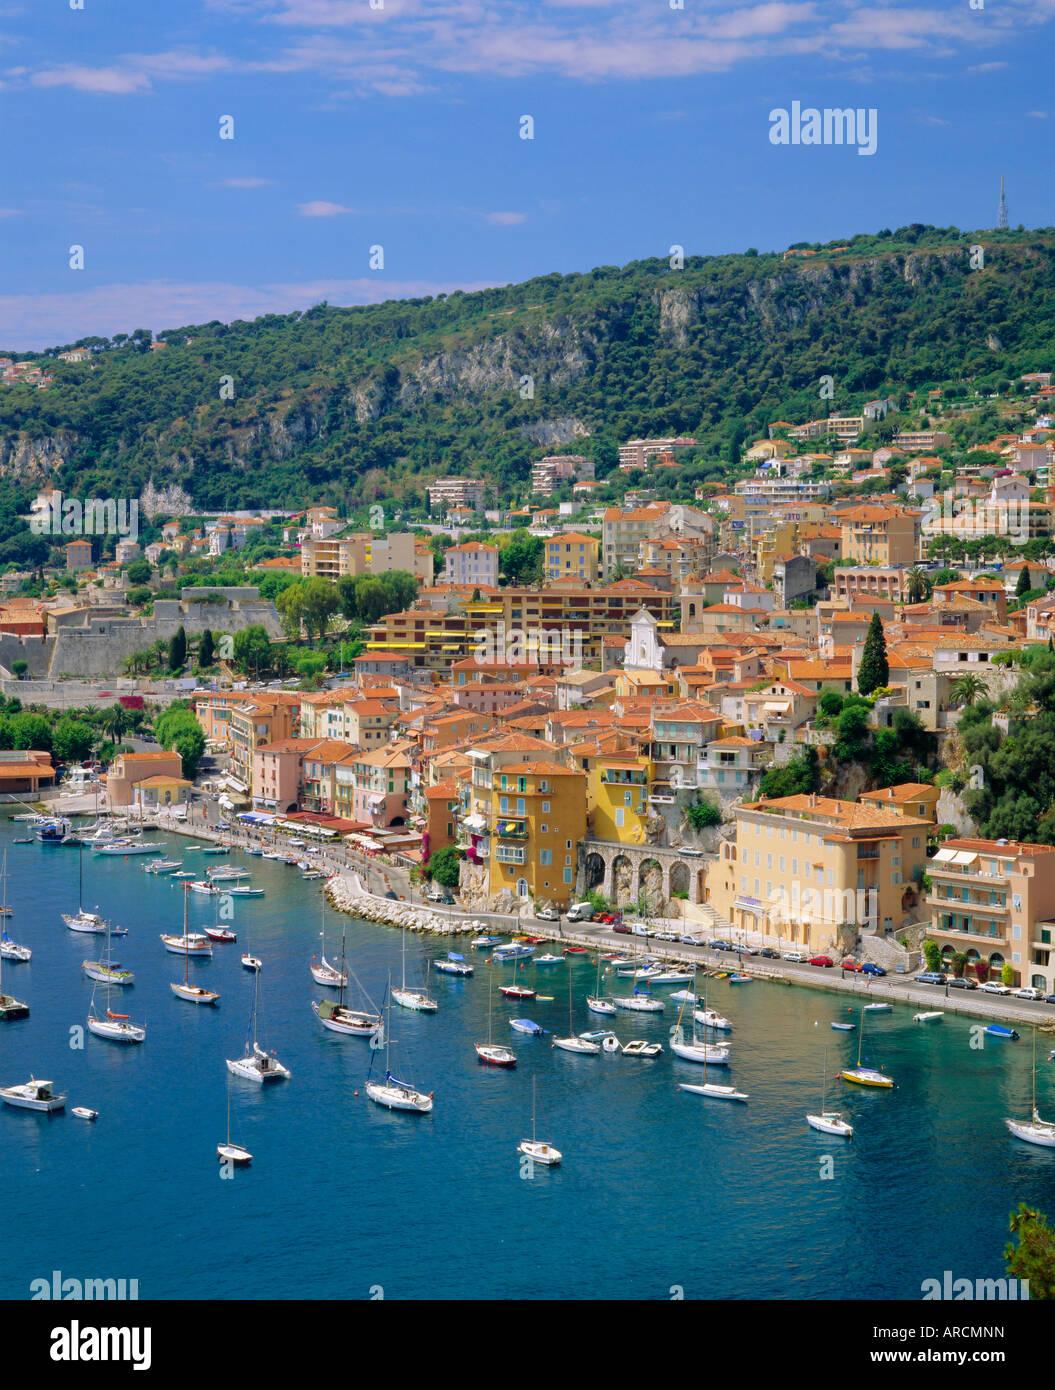 Villefranche, Côte d'Azur, Provence, France, Europe Photo Stock